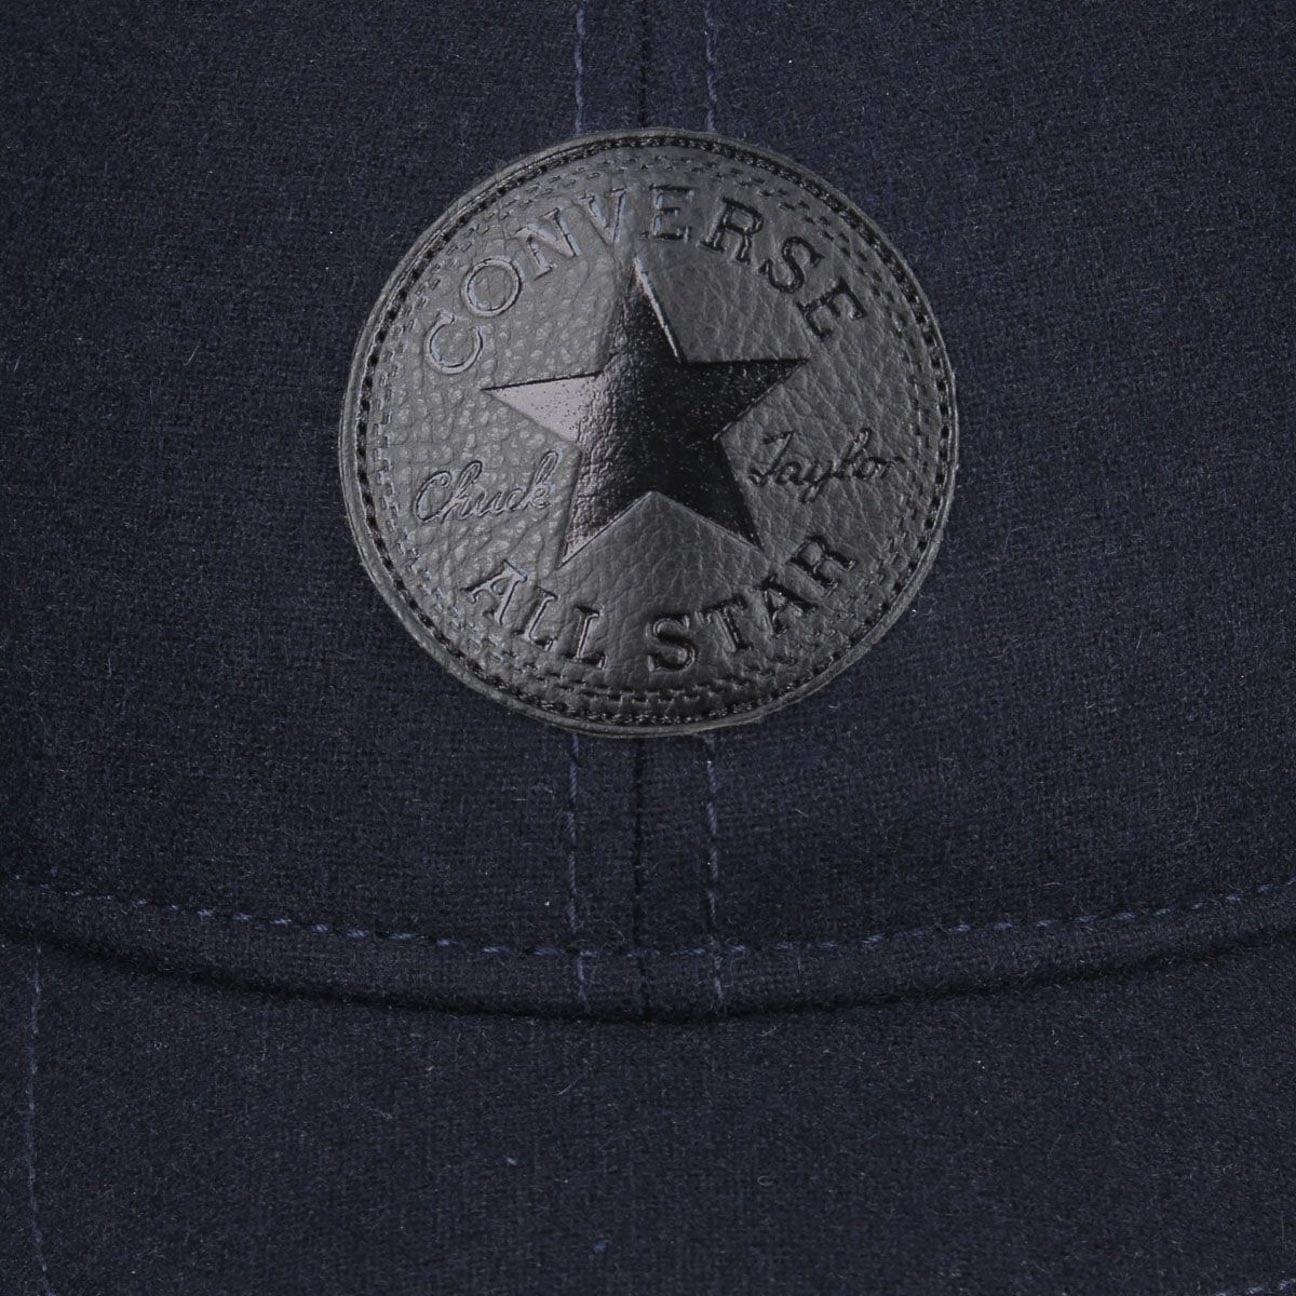 9d5ff6f1687 ... Core Wool Baseball Cap by Converse - bordeaux 5 ...